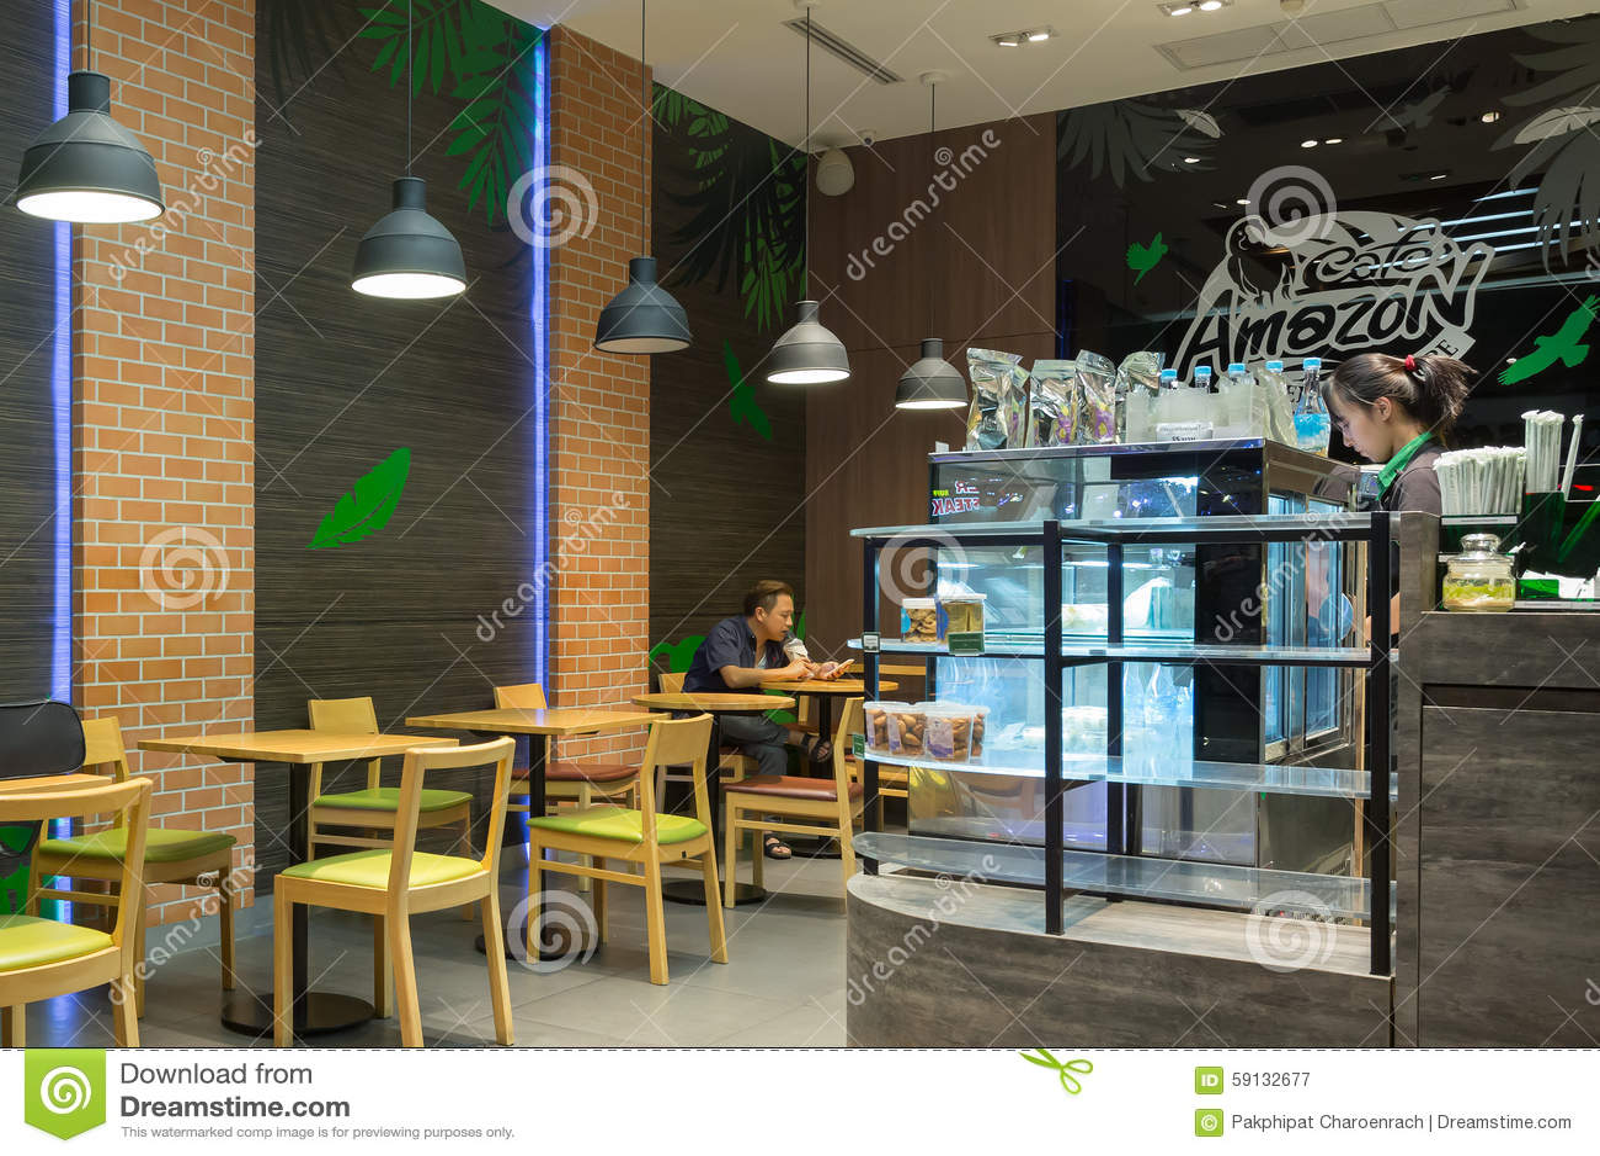 Interior view of cafe amazon coffee shop editorial for Amazon design shop